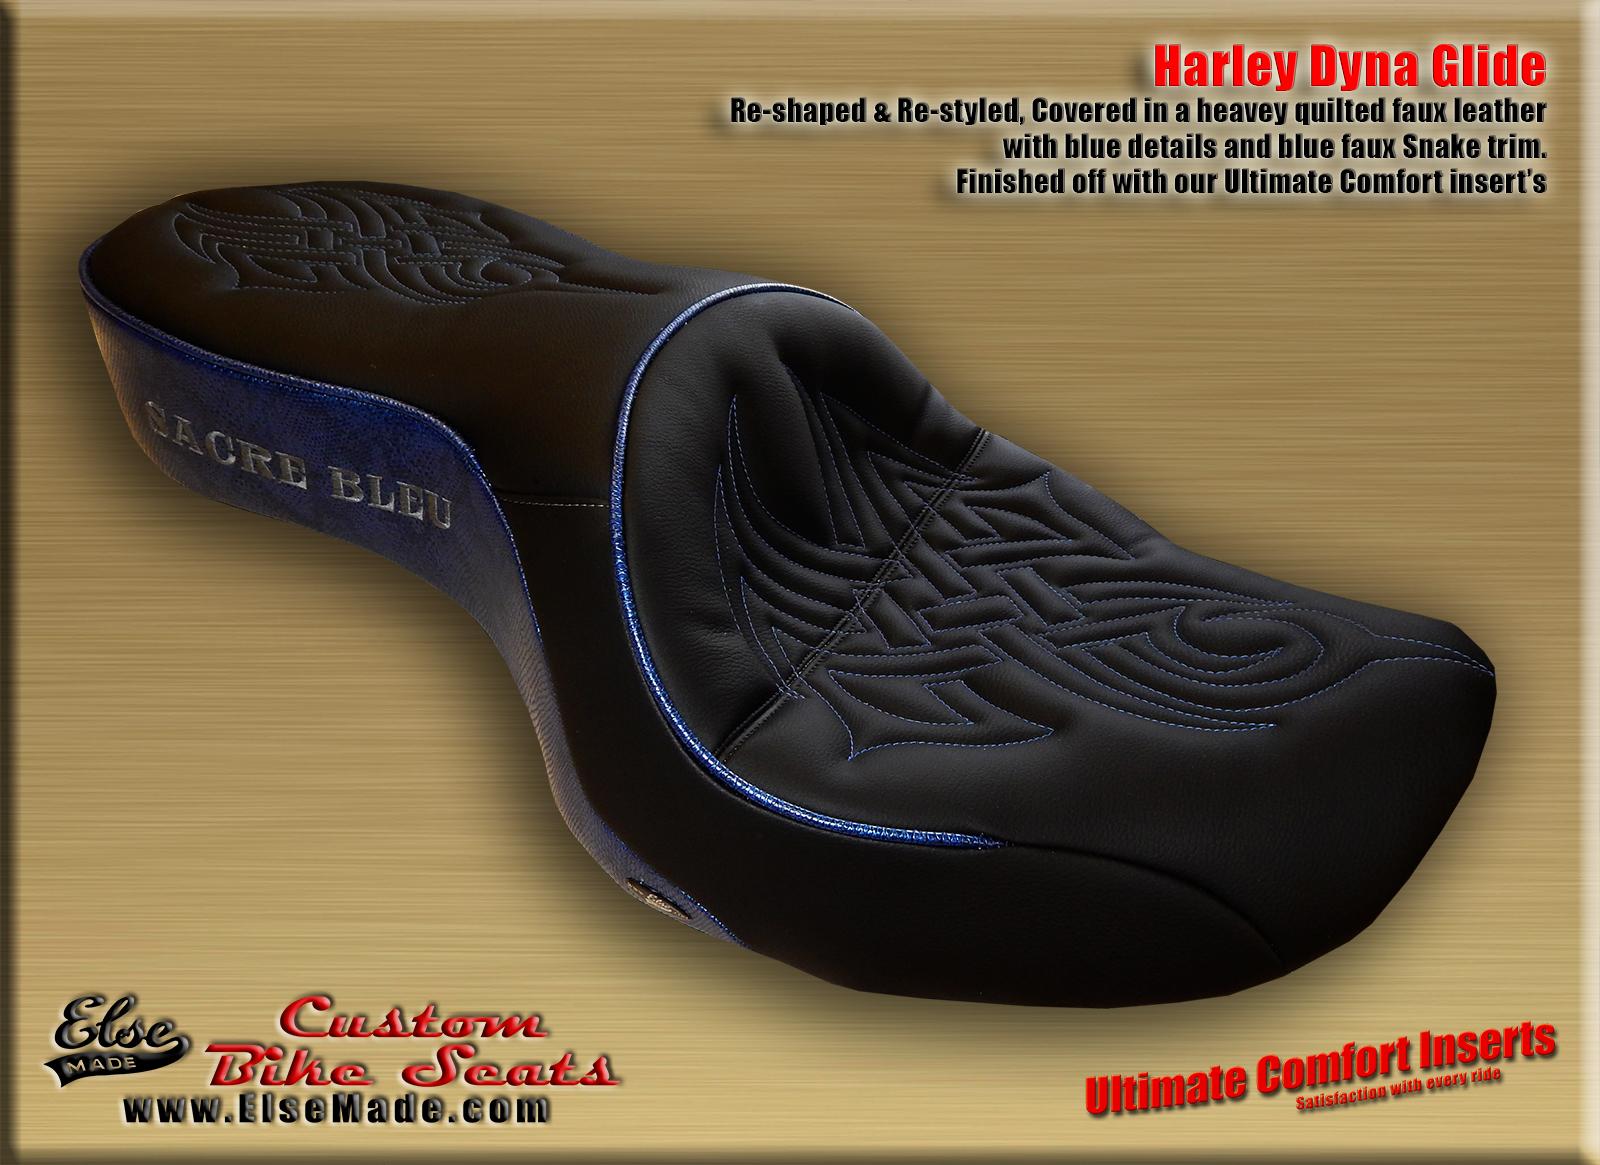 Harley dyna glide full size 1600.jpg